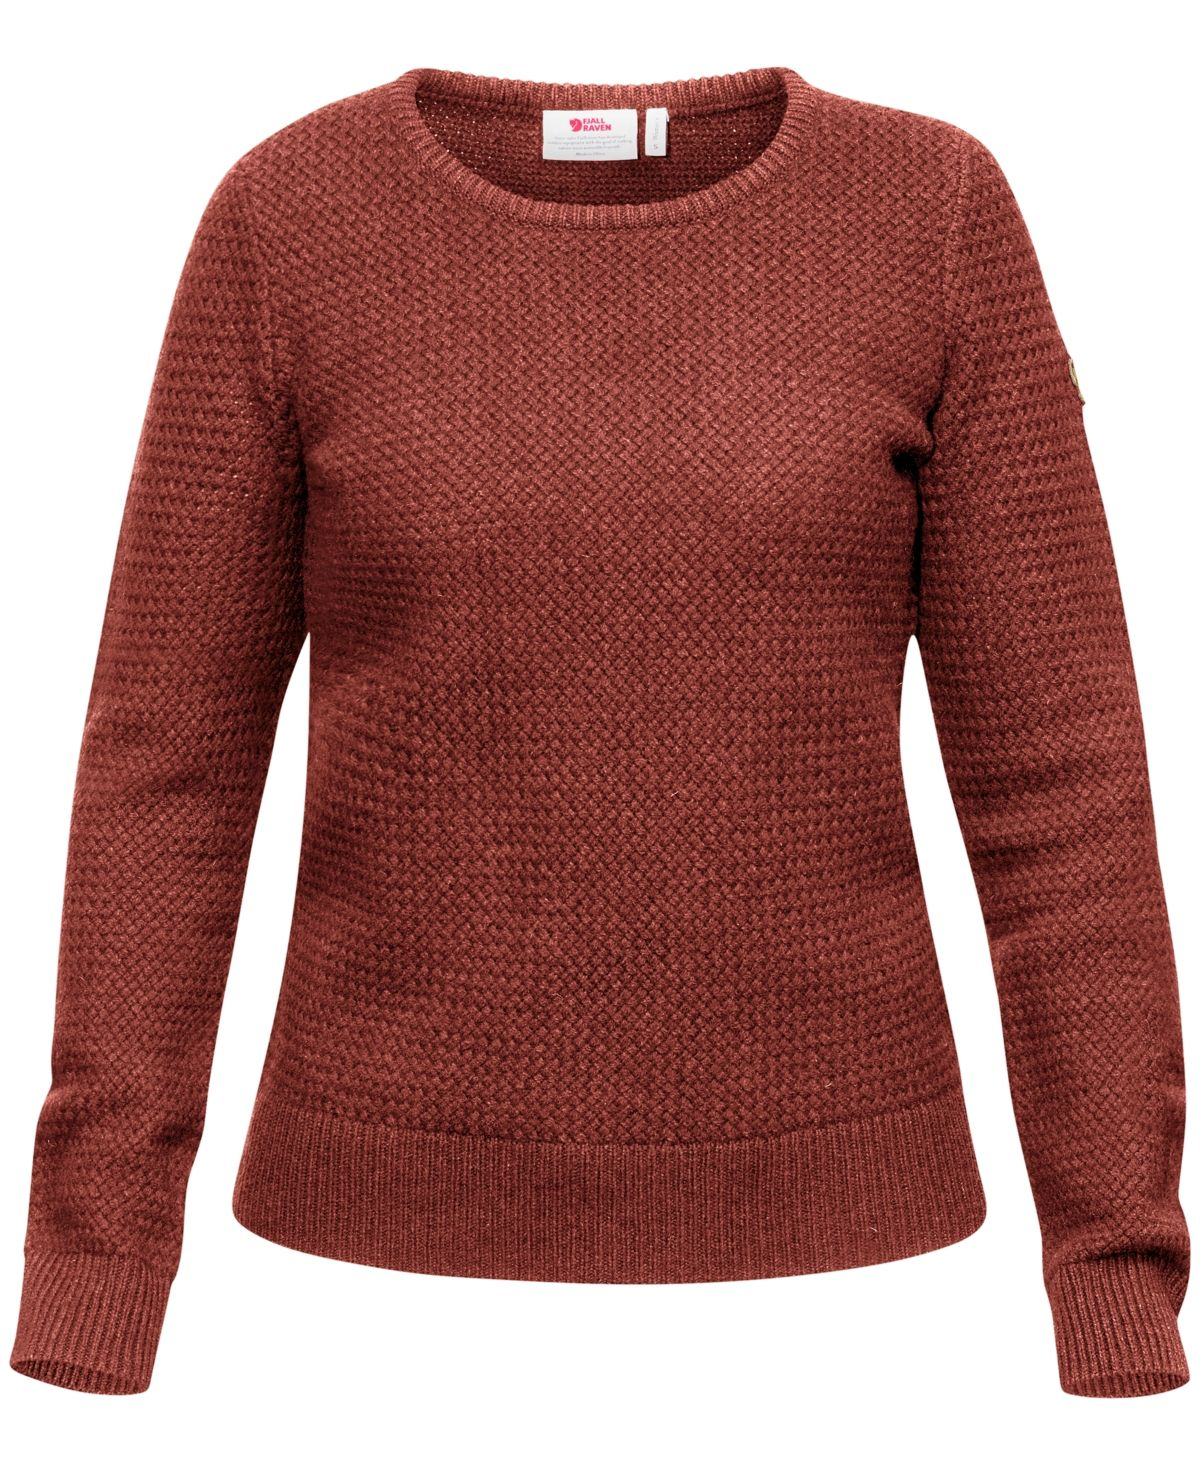 Photo of Fjällräven Ovik Wool Active Sweater & Bewertungen – Tops – Women – Macy & # 39; s